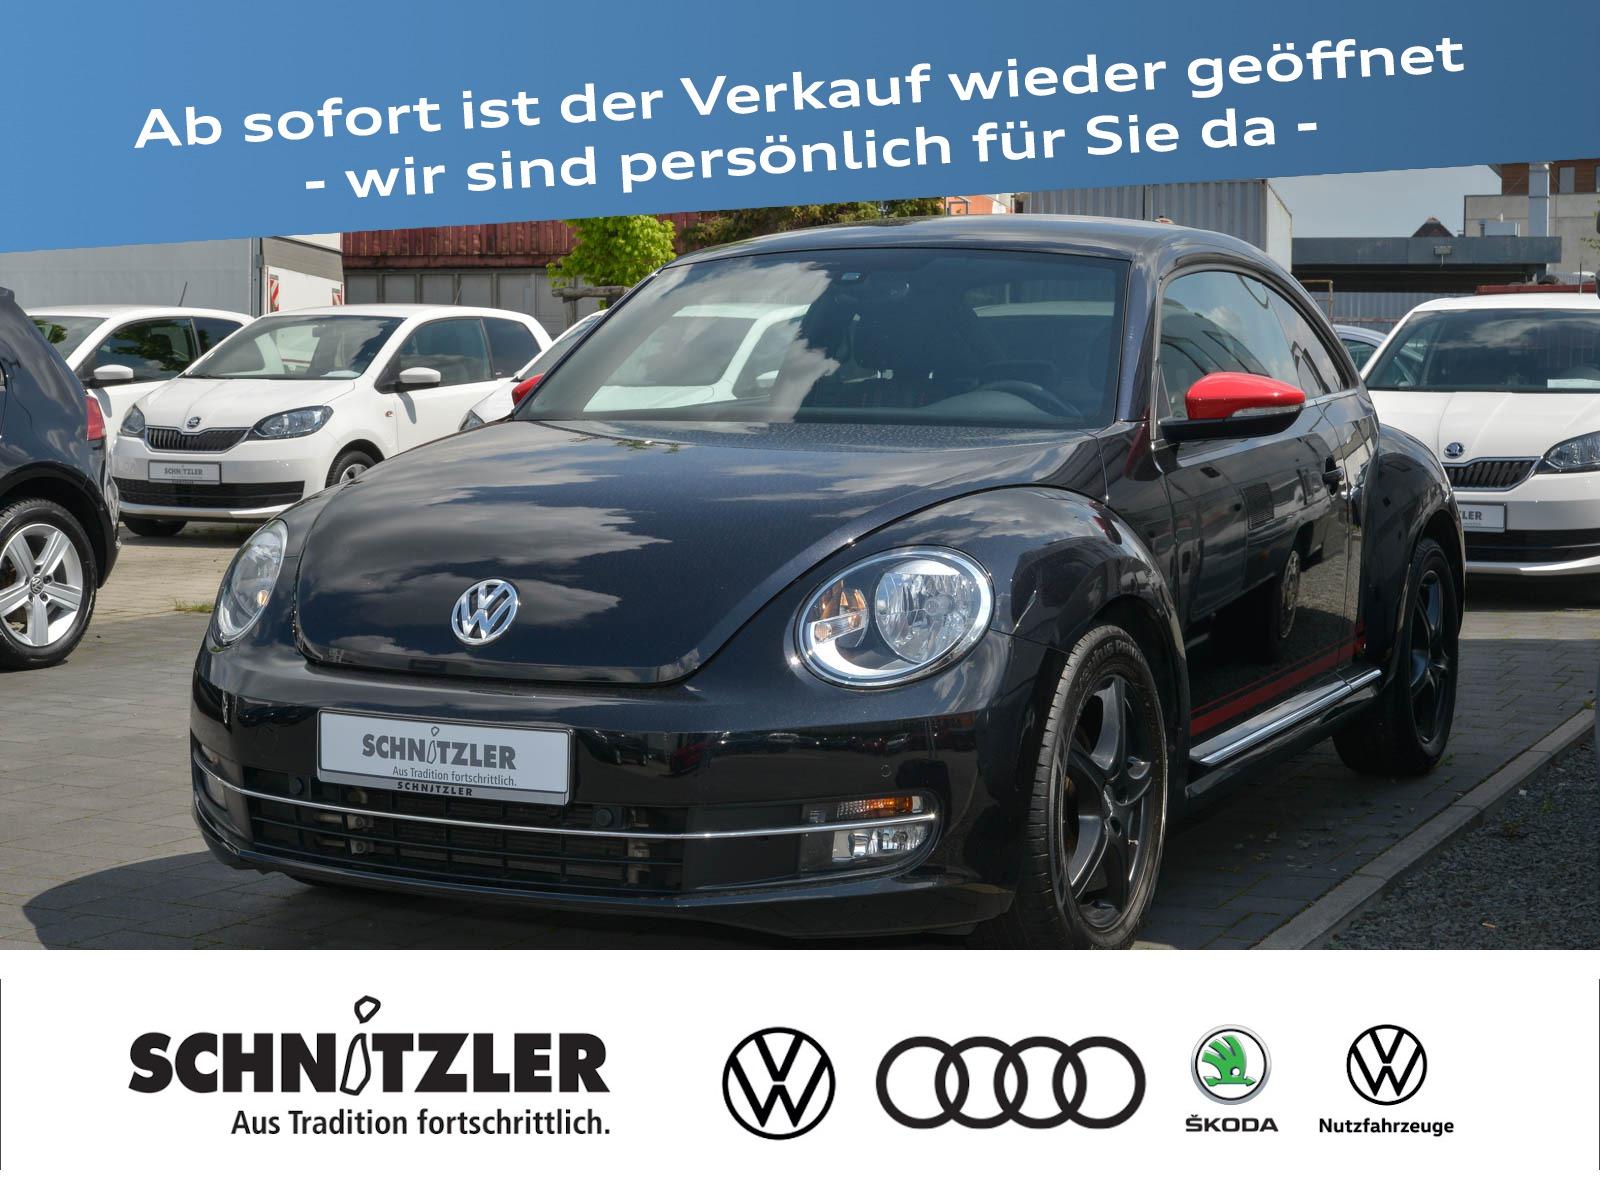 Volkswagen Beetle 1.2 TSI CLUB NAVI/PDC/SHZ+++, Jahr 2015, Benzin